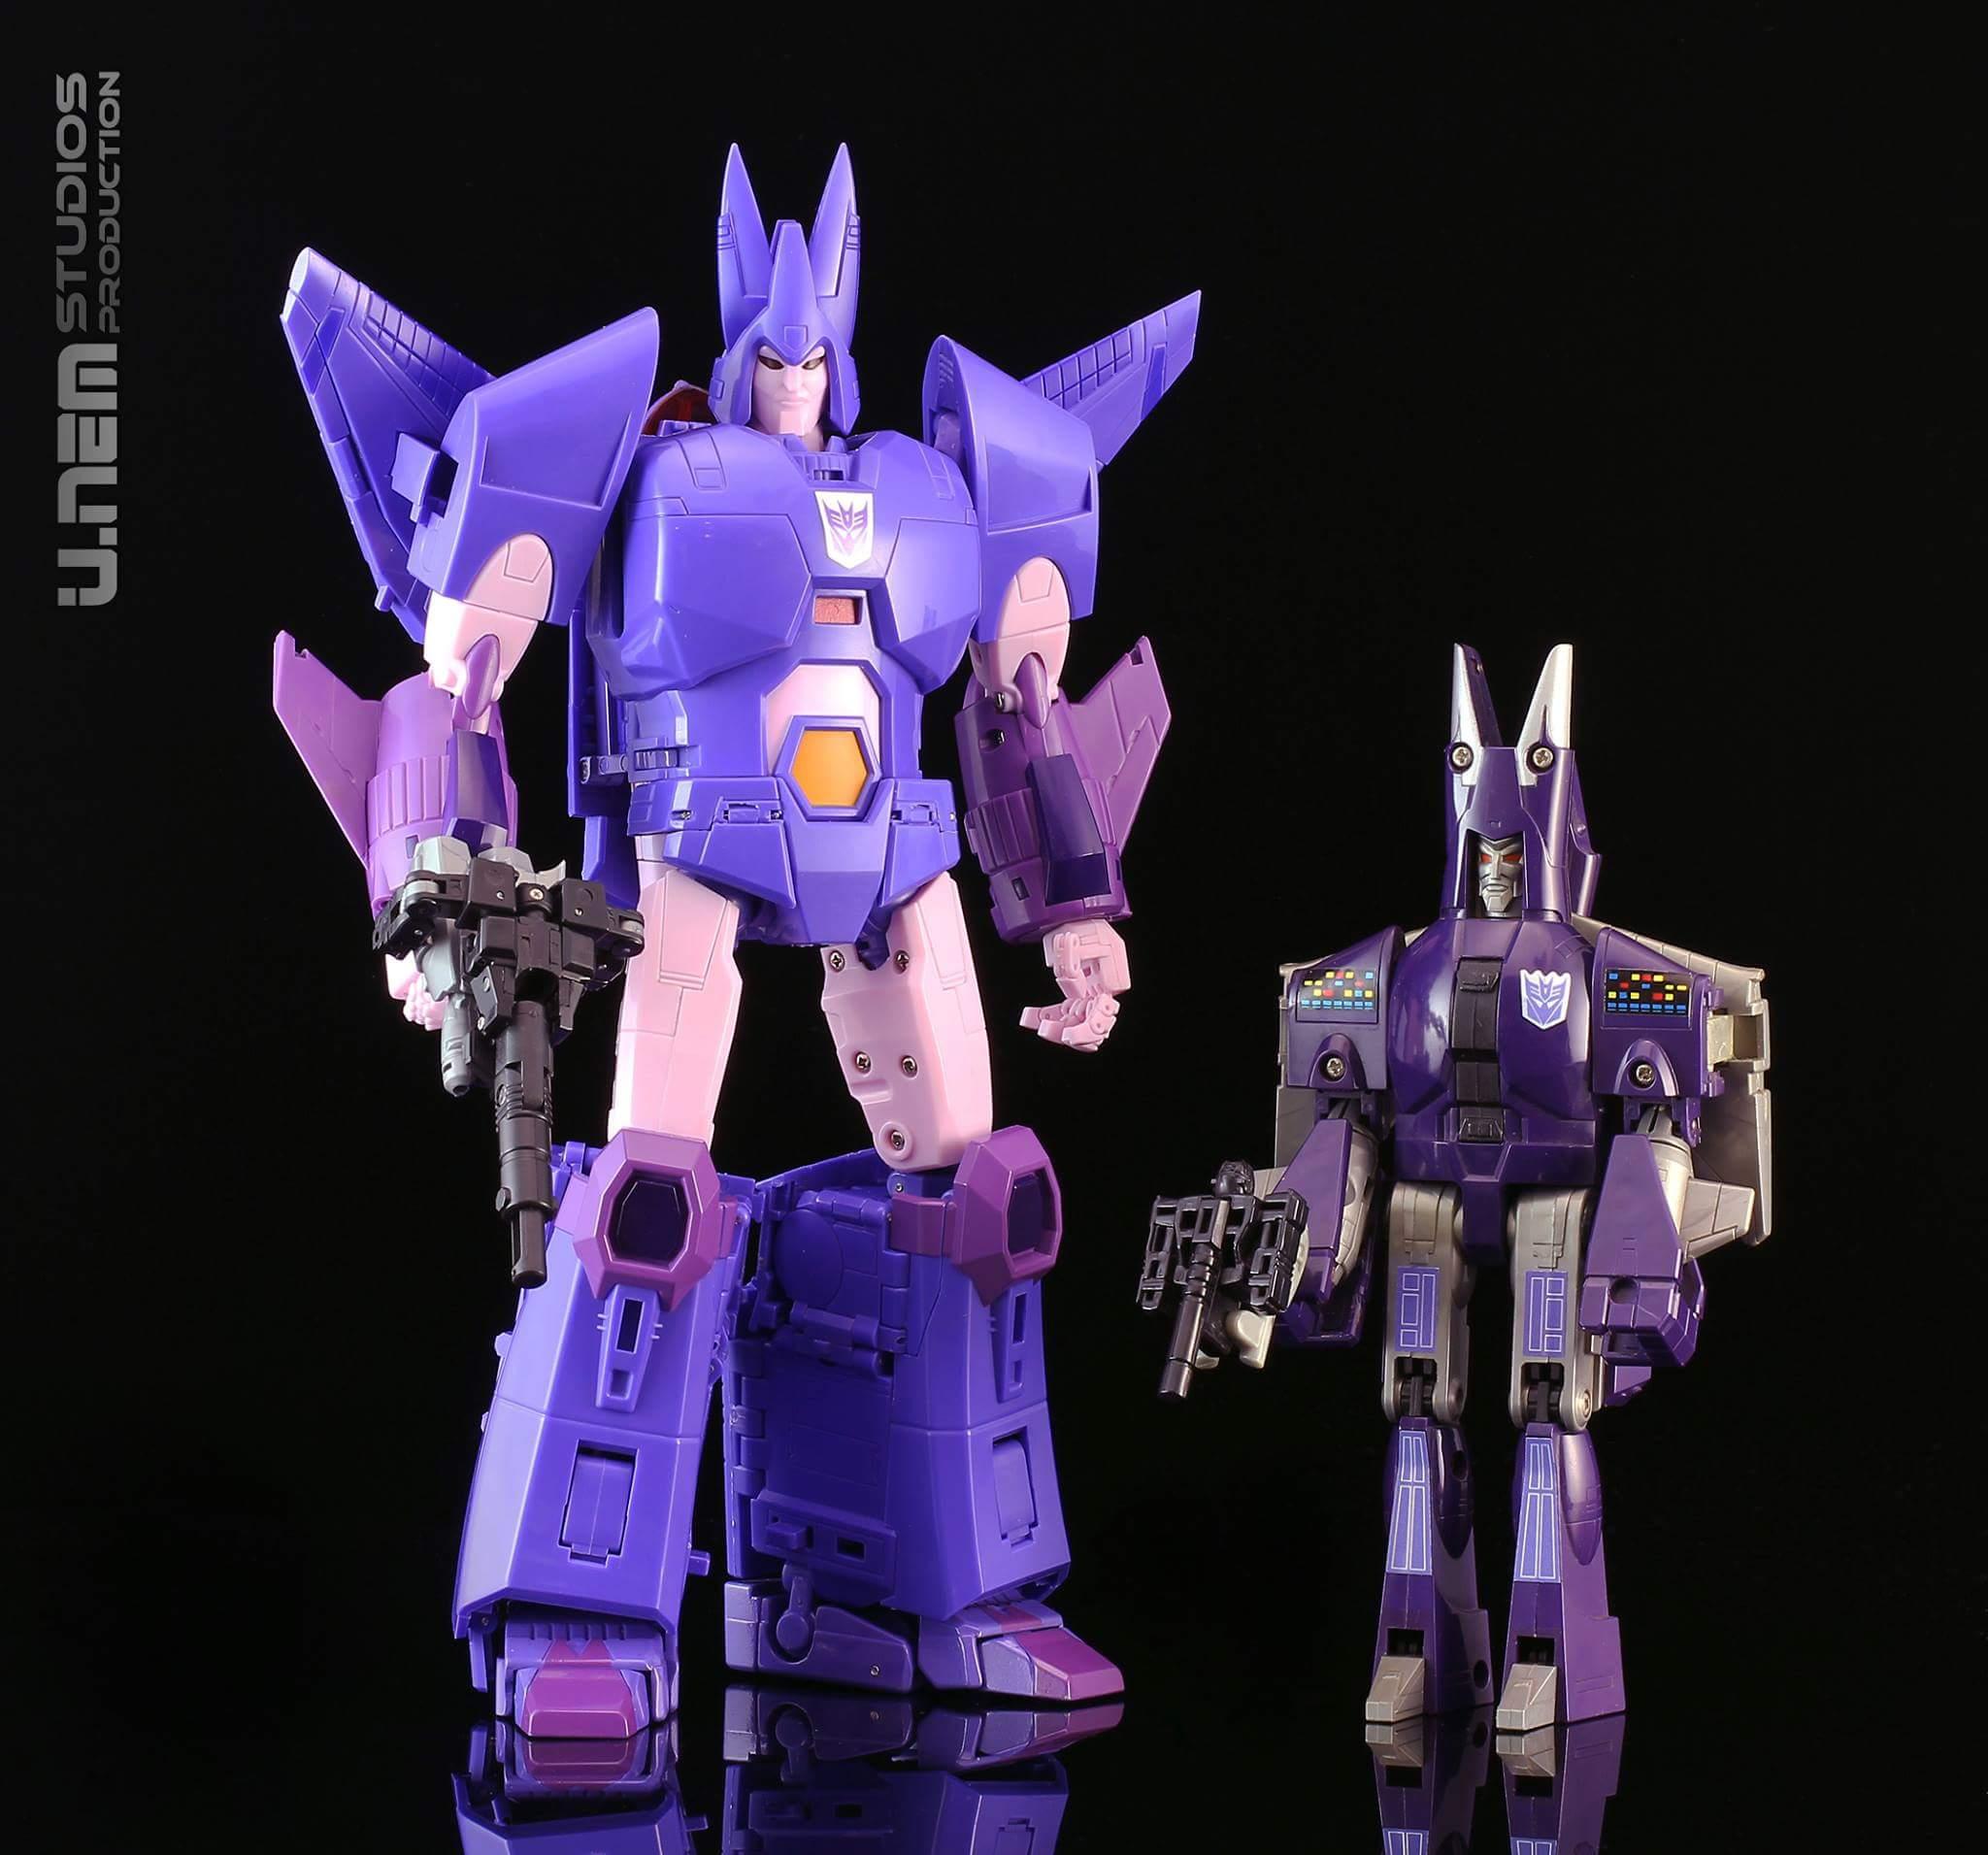 [X-Transbots] Produit Tiers - MX-III Eligos - aka Cyclonus - Page 3 N5kPRAI9